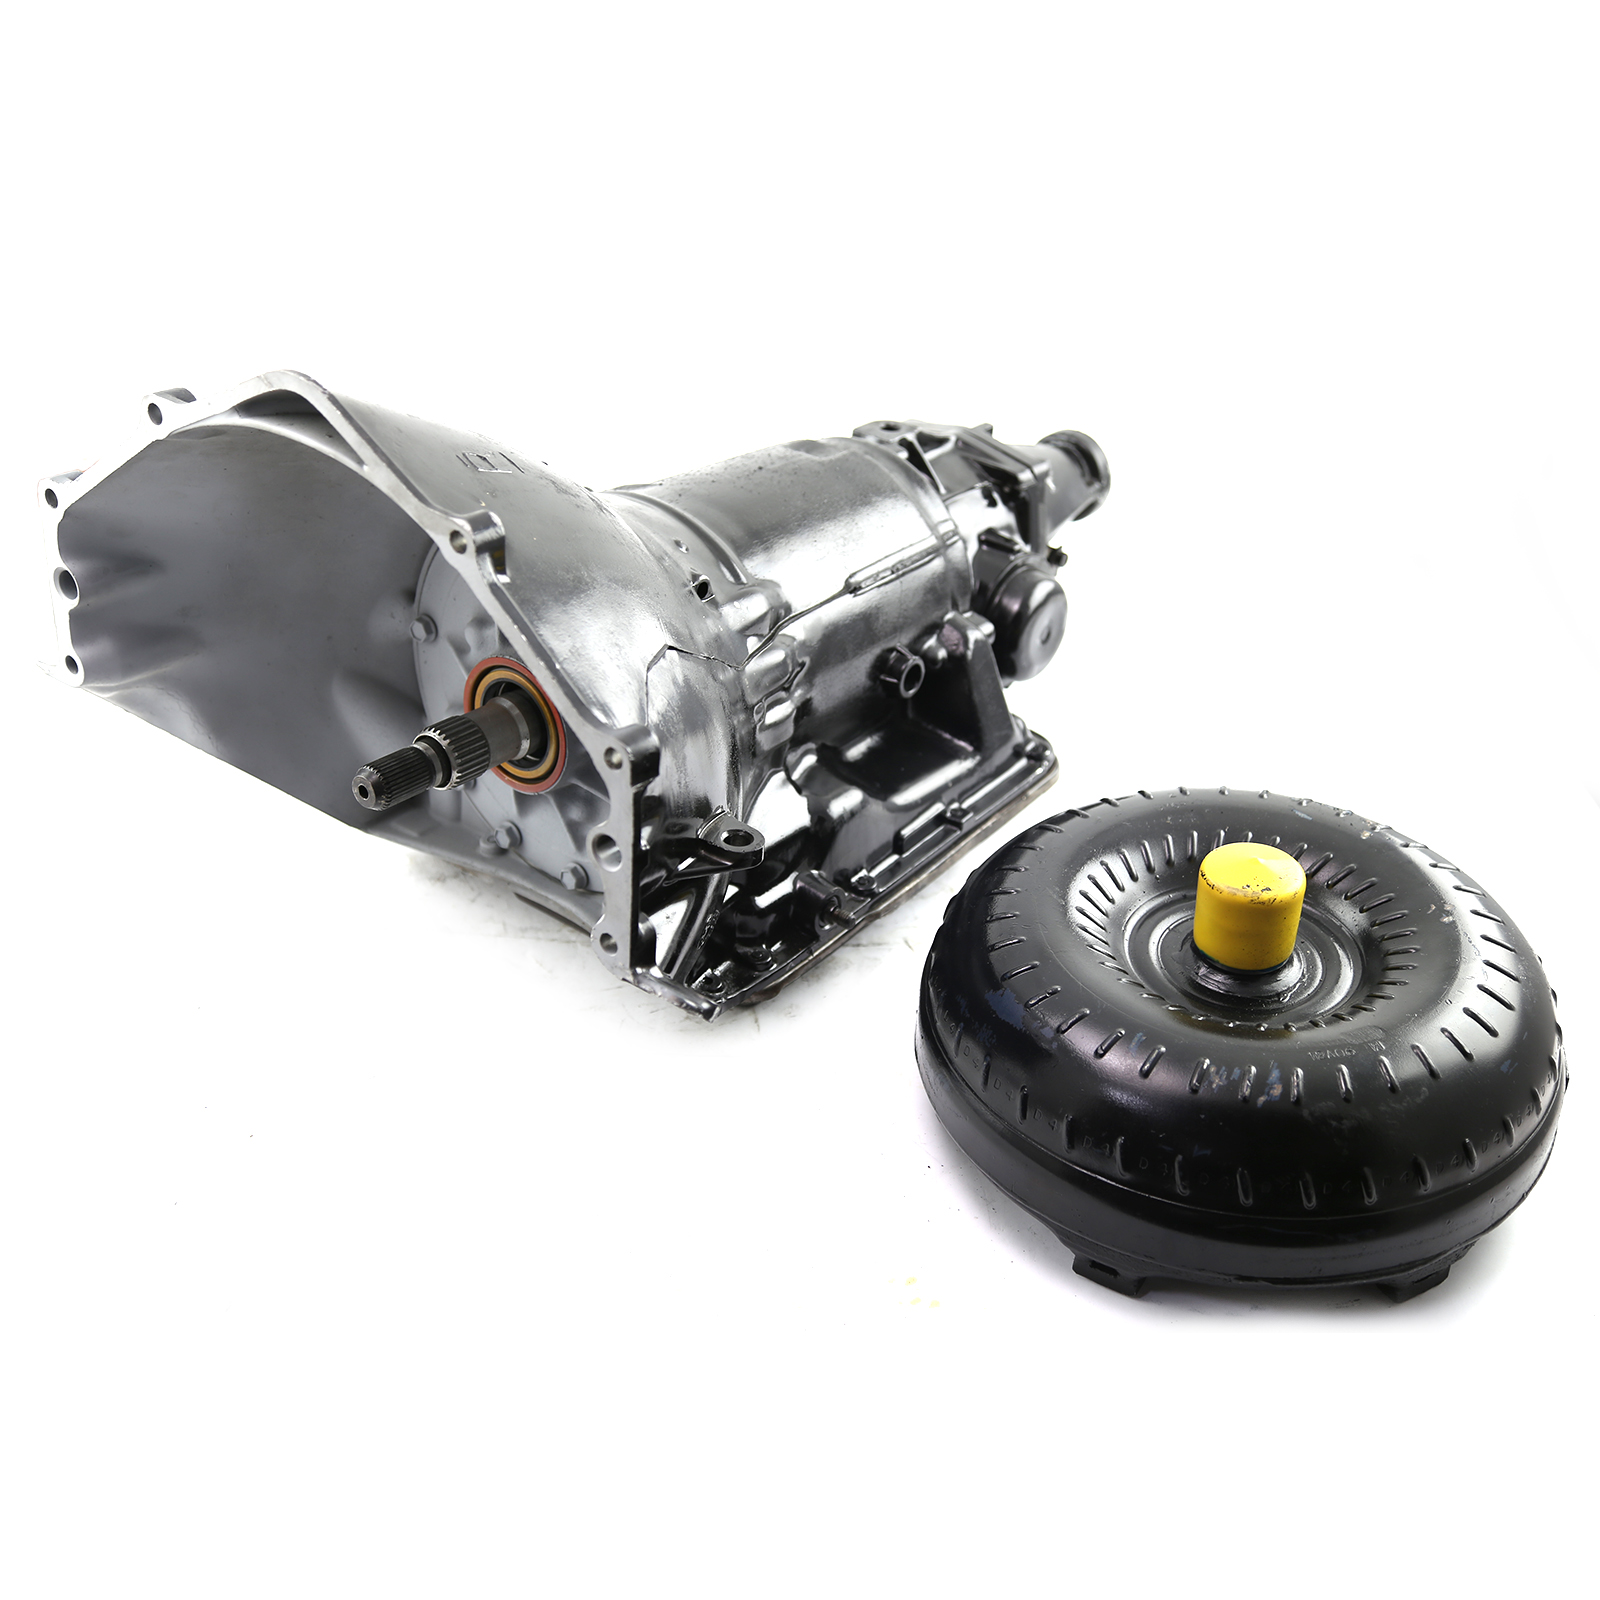 Turbo 700R-4 Th700R-4 Gm Performance Rebuilt Overdrive Transmission W/ Converter